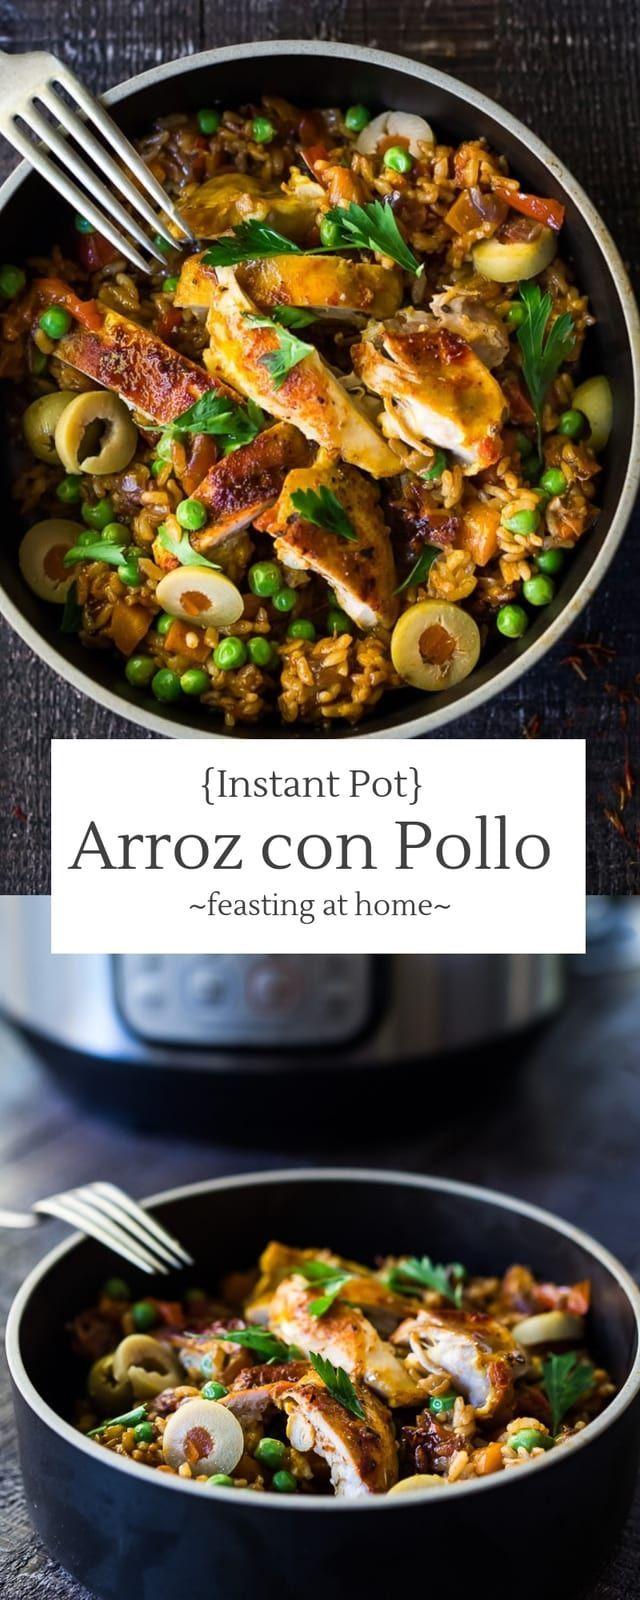 Instant Pot Arroz Con Pollo